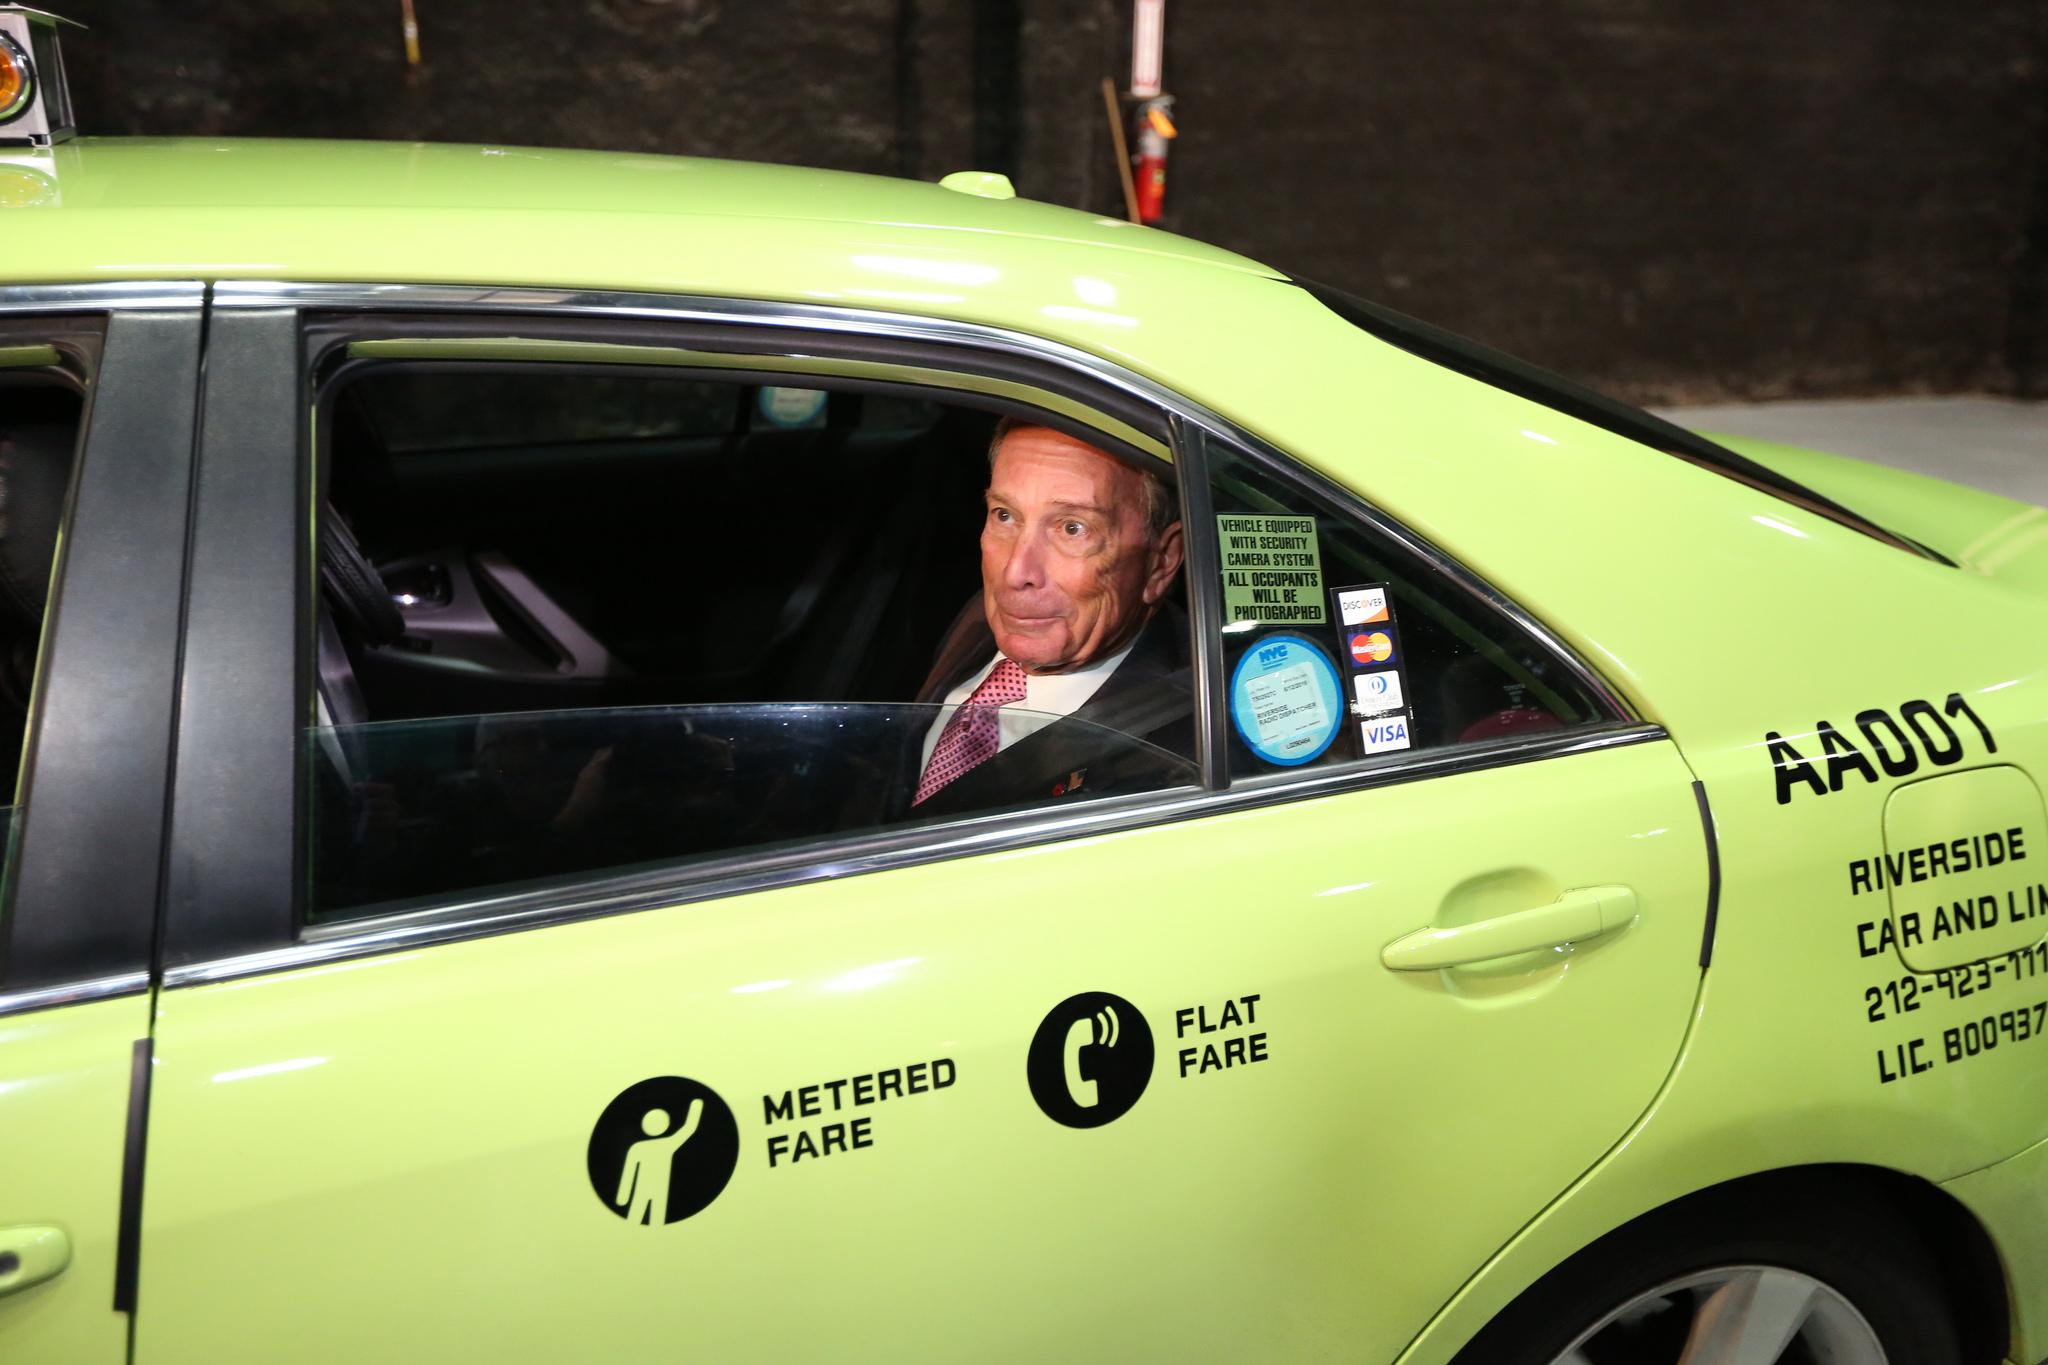 FOILing NYC's *Boro* Taxi Trip Data – Chris Whong